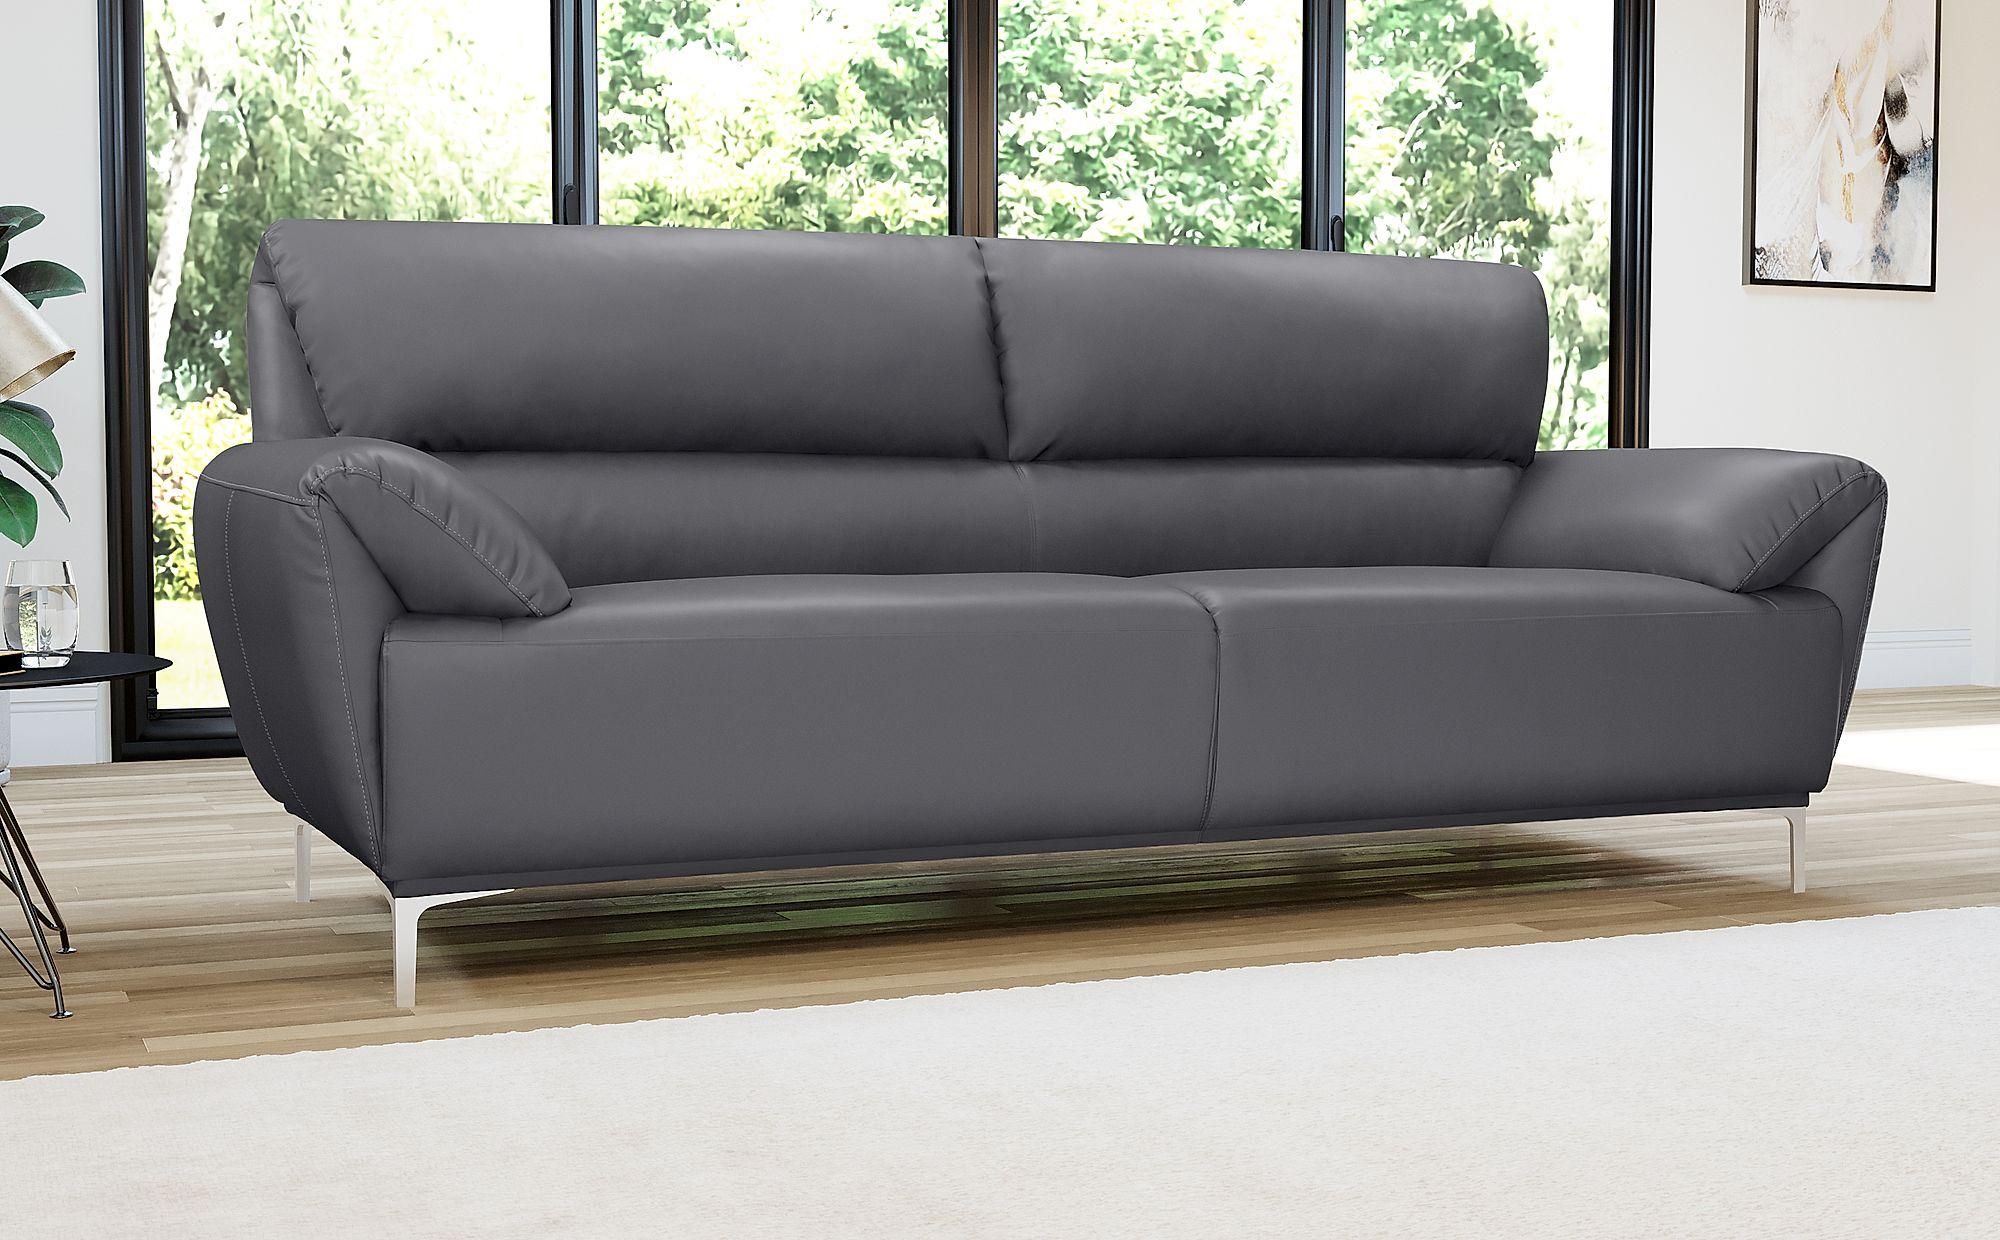 Enzo Grey Leather Sofa - 3 Seater